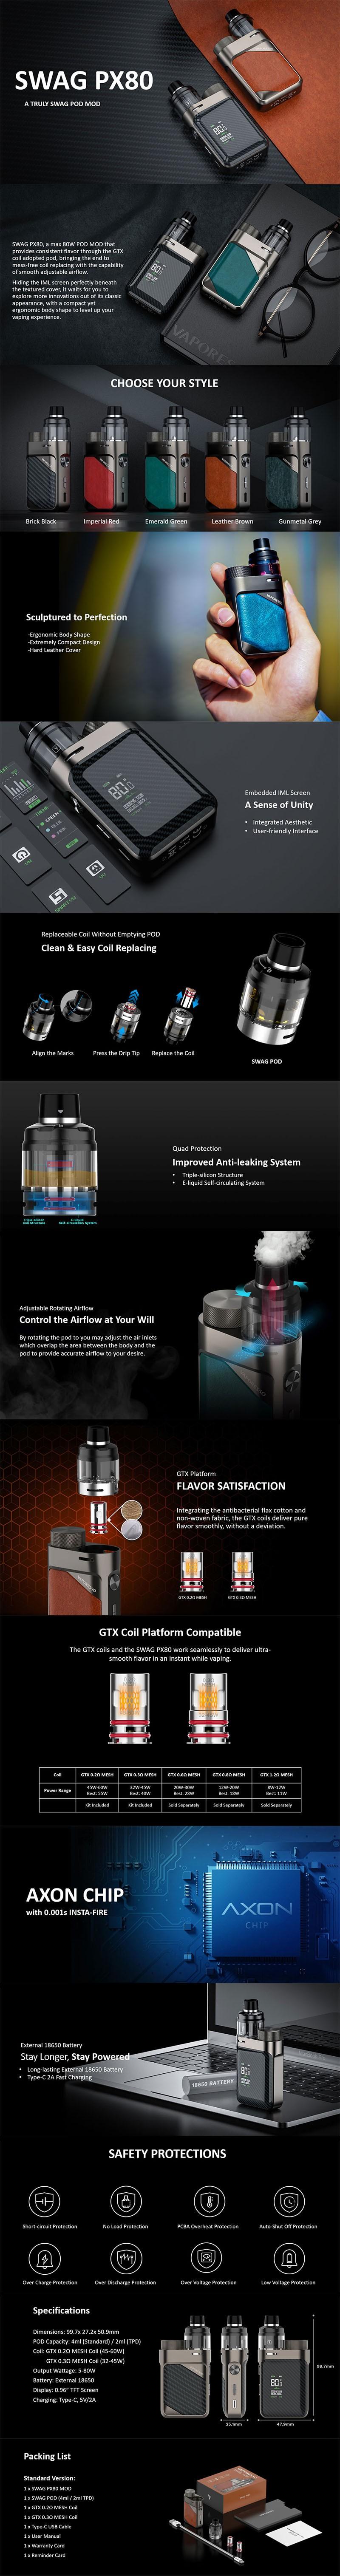 Authentic Vaporesso Swag PX80 Kit 80W Box Mod + Swag 4ml Pod Tank